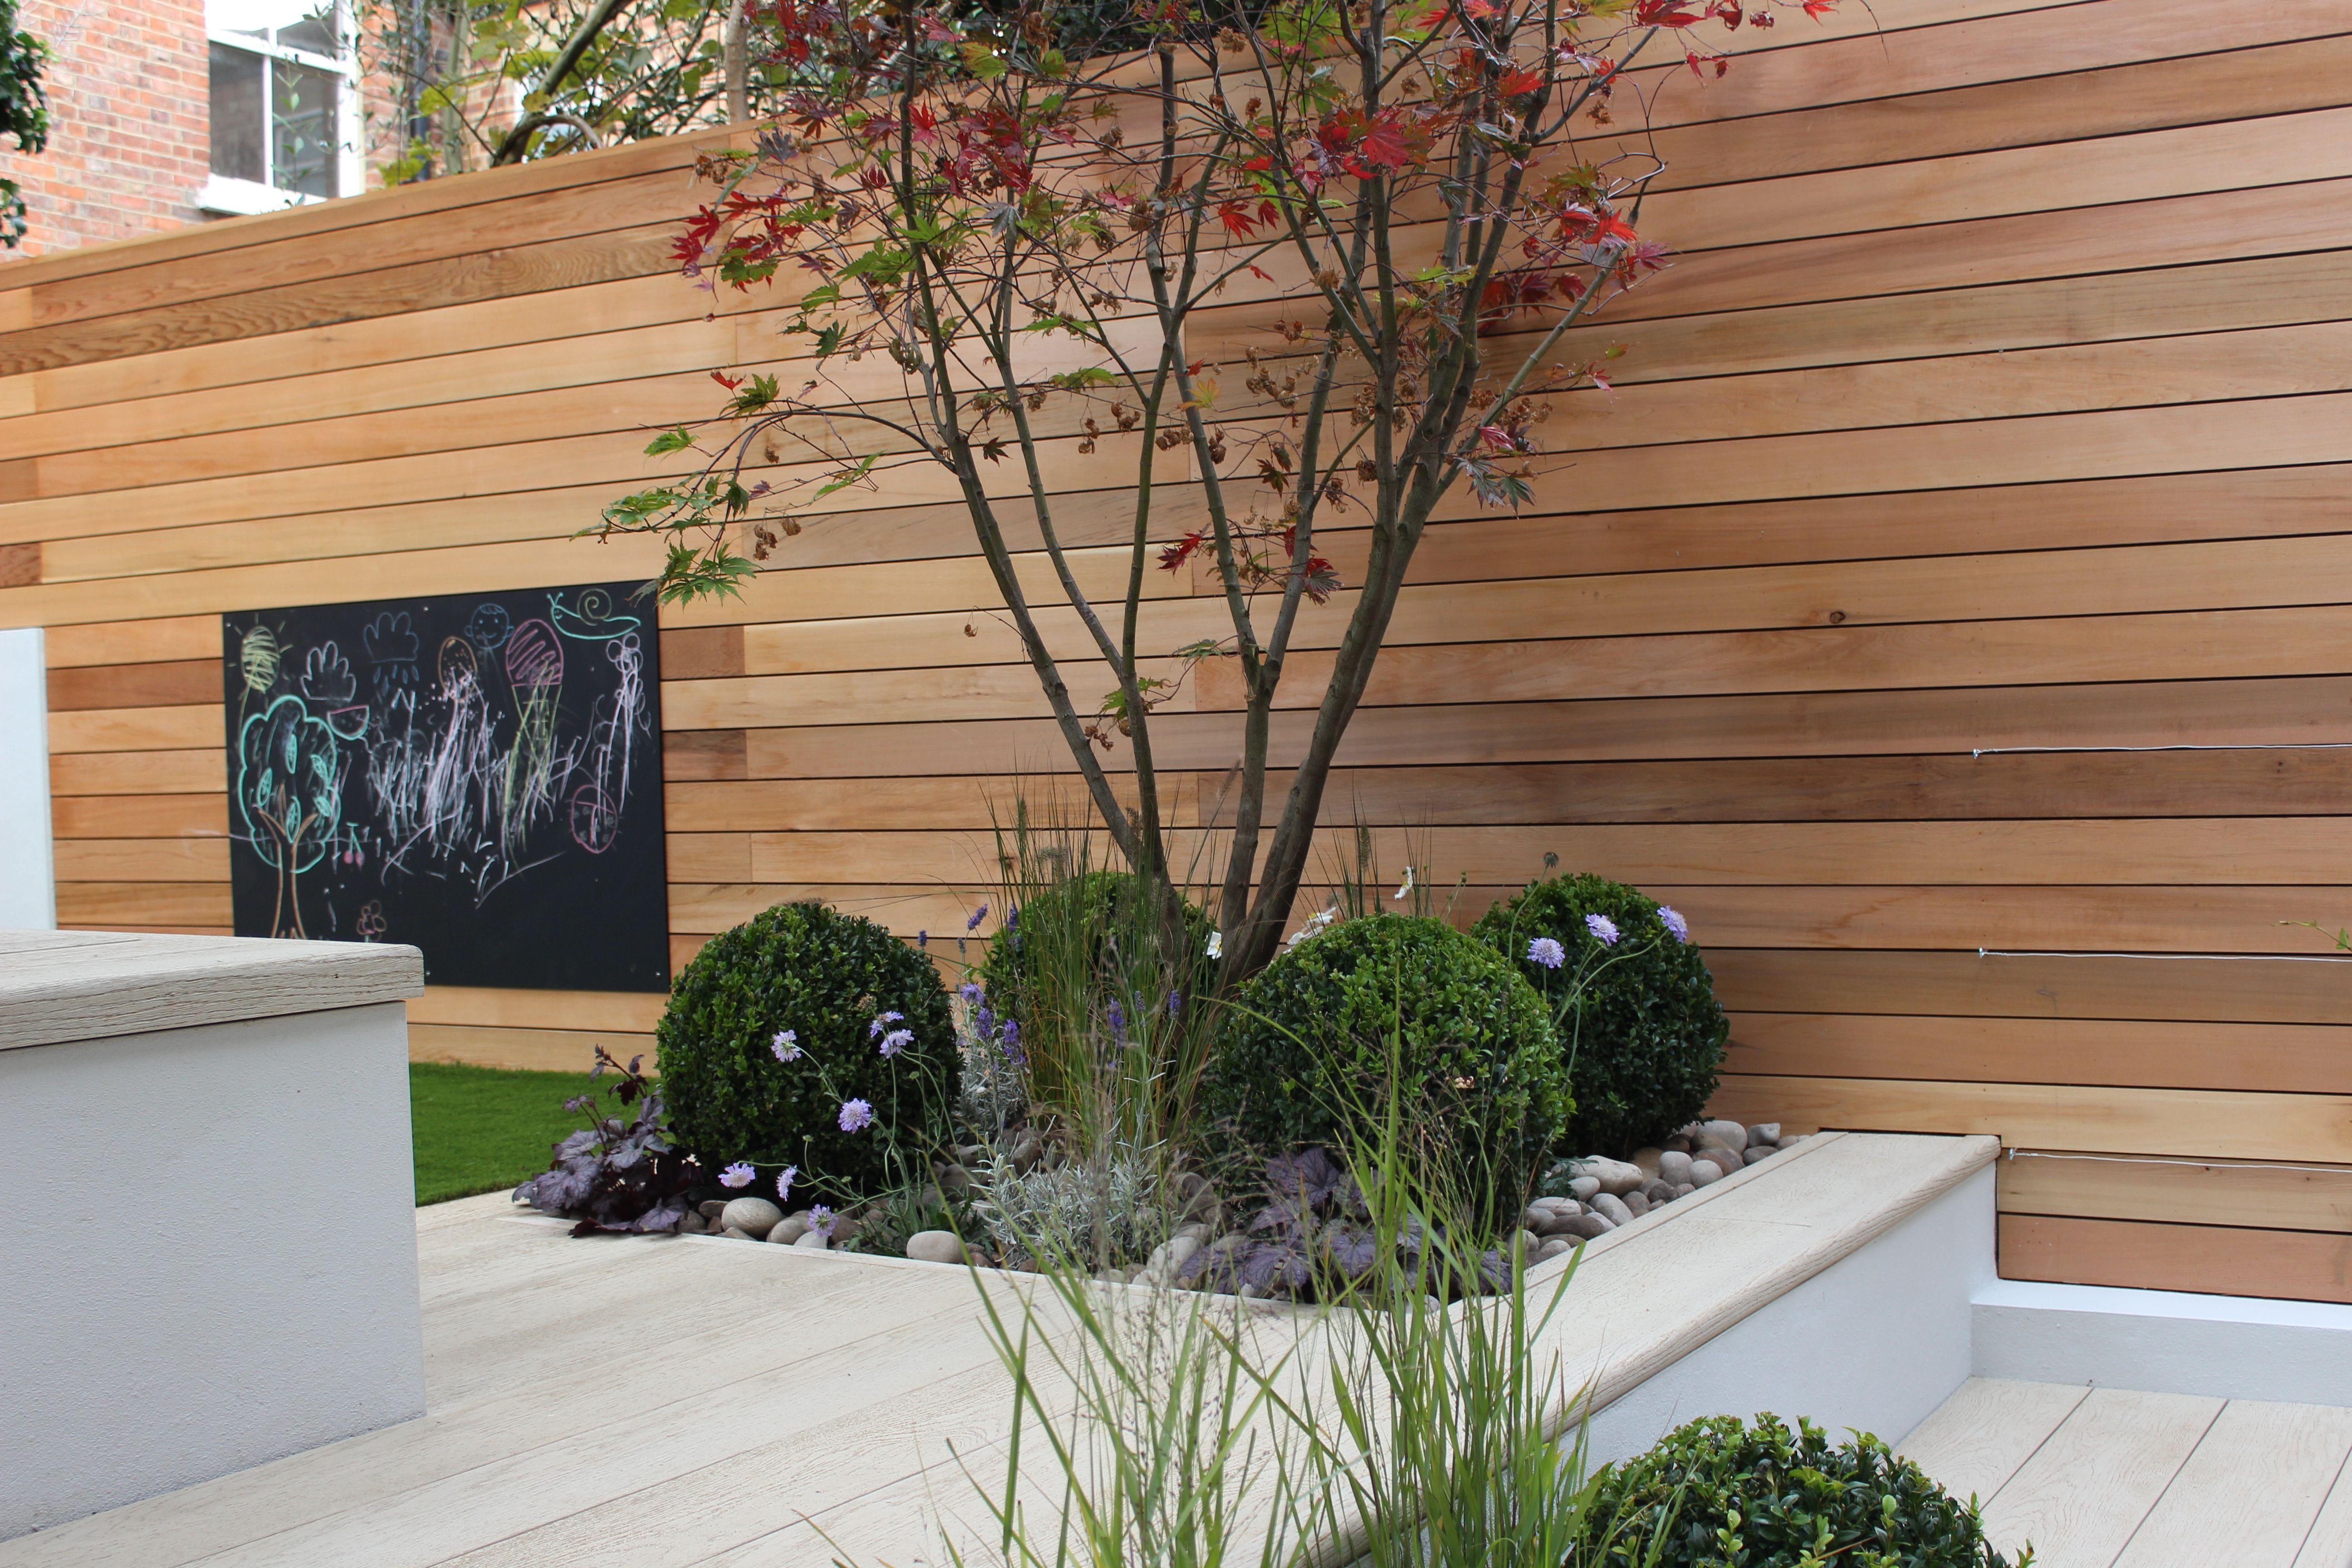 cedar screening buxus balls and millboard decking in a